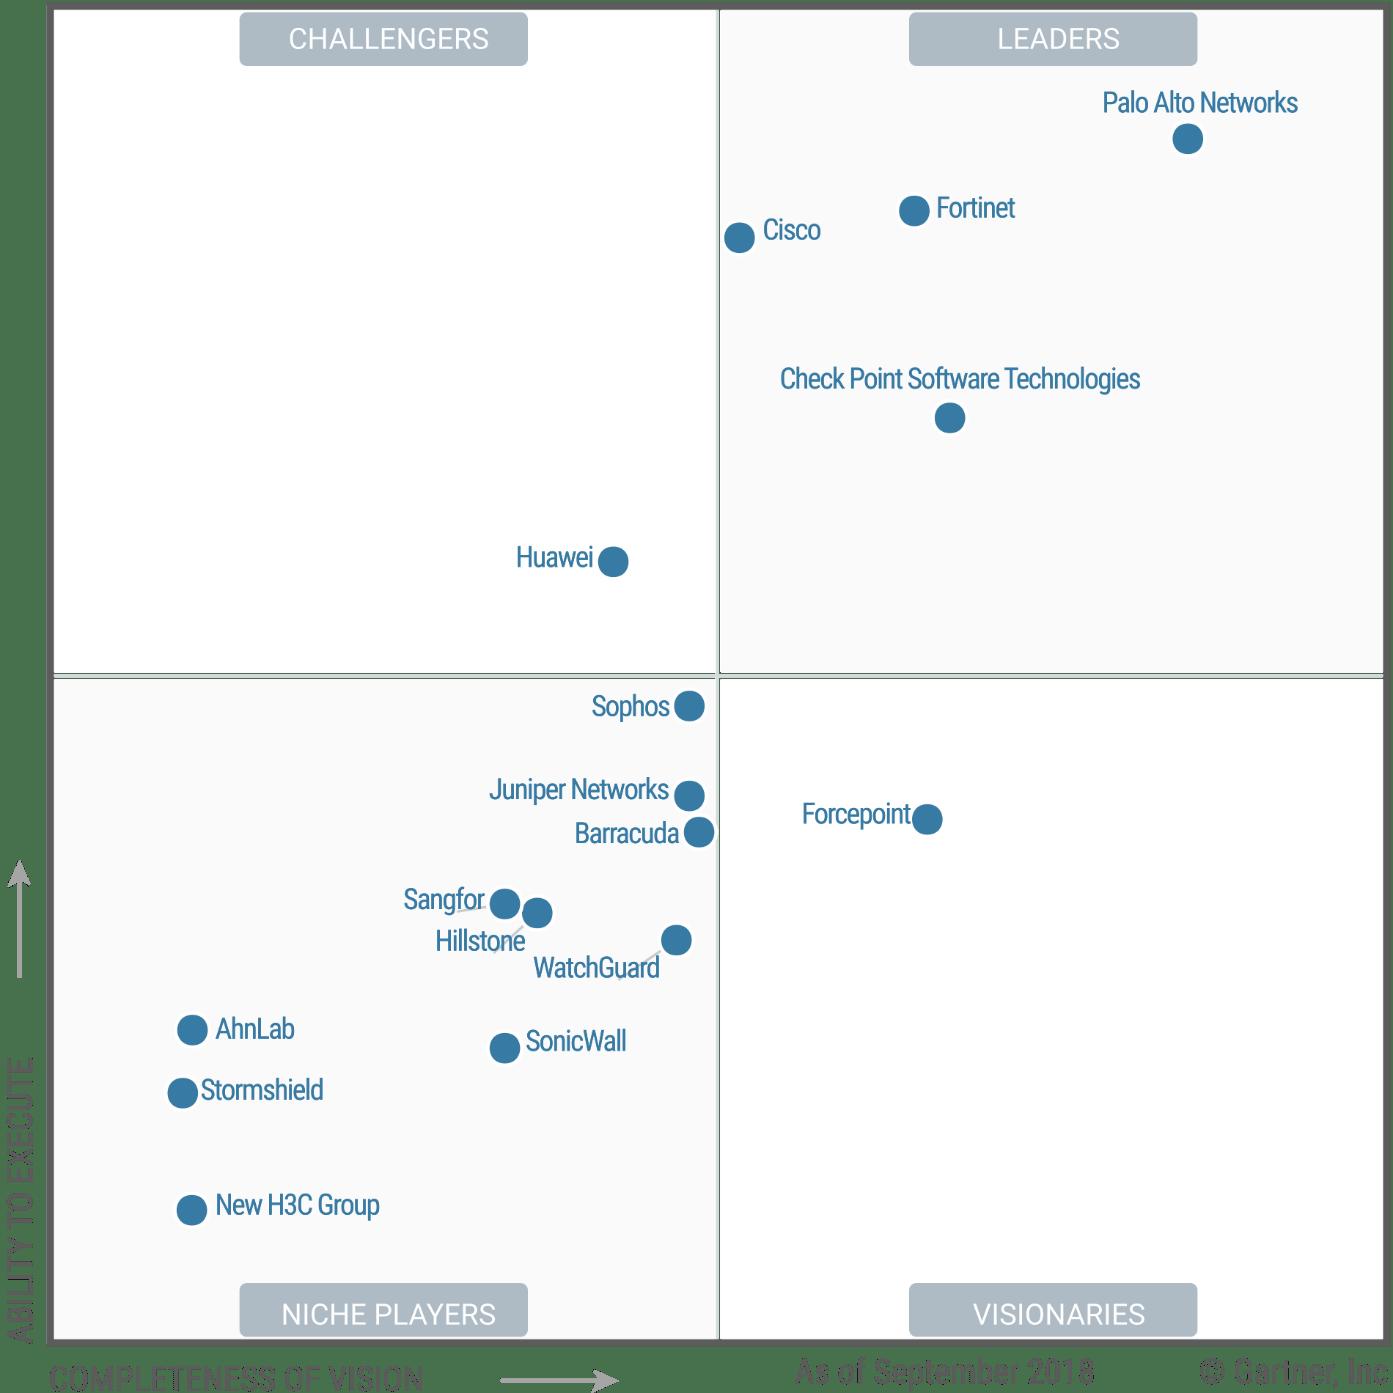 Magic Quadrant for Enterprise Network Firewalls 2018 (G00337968)